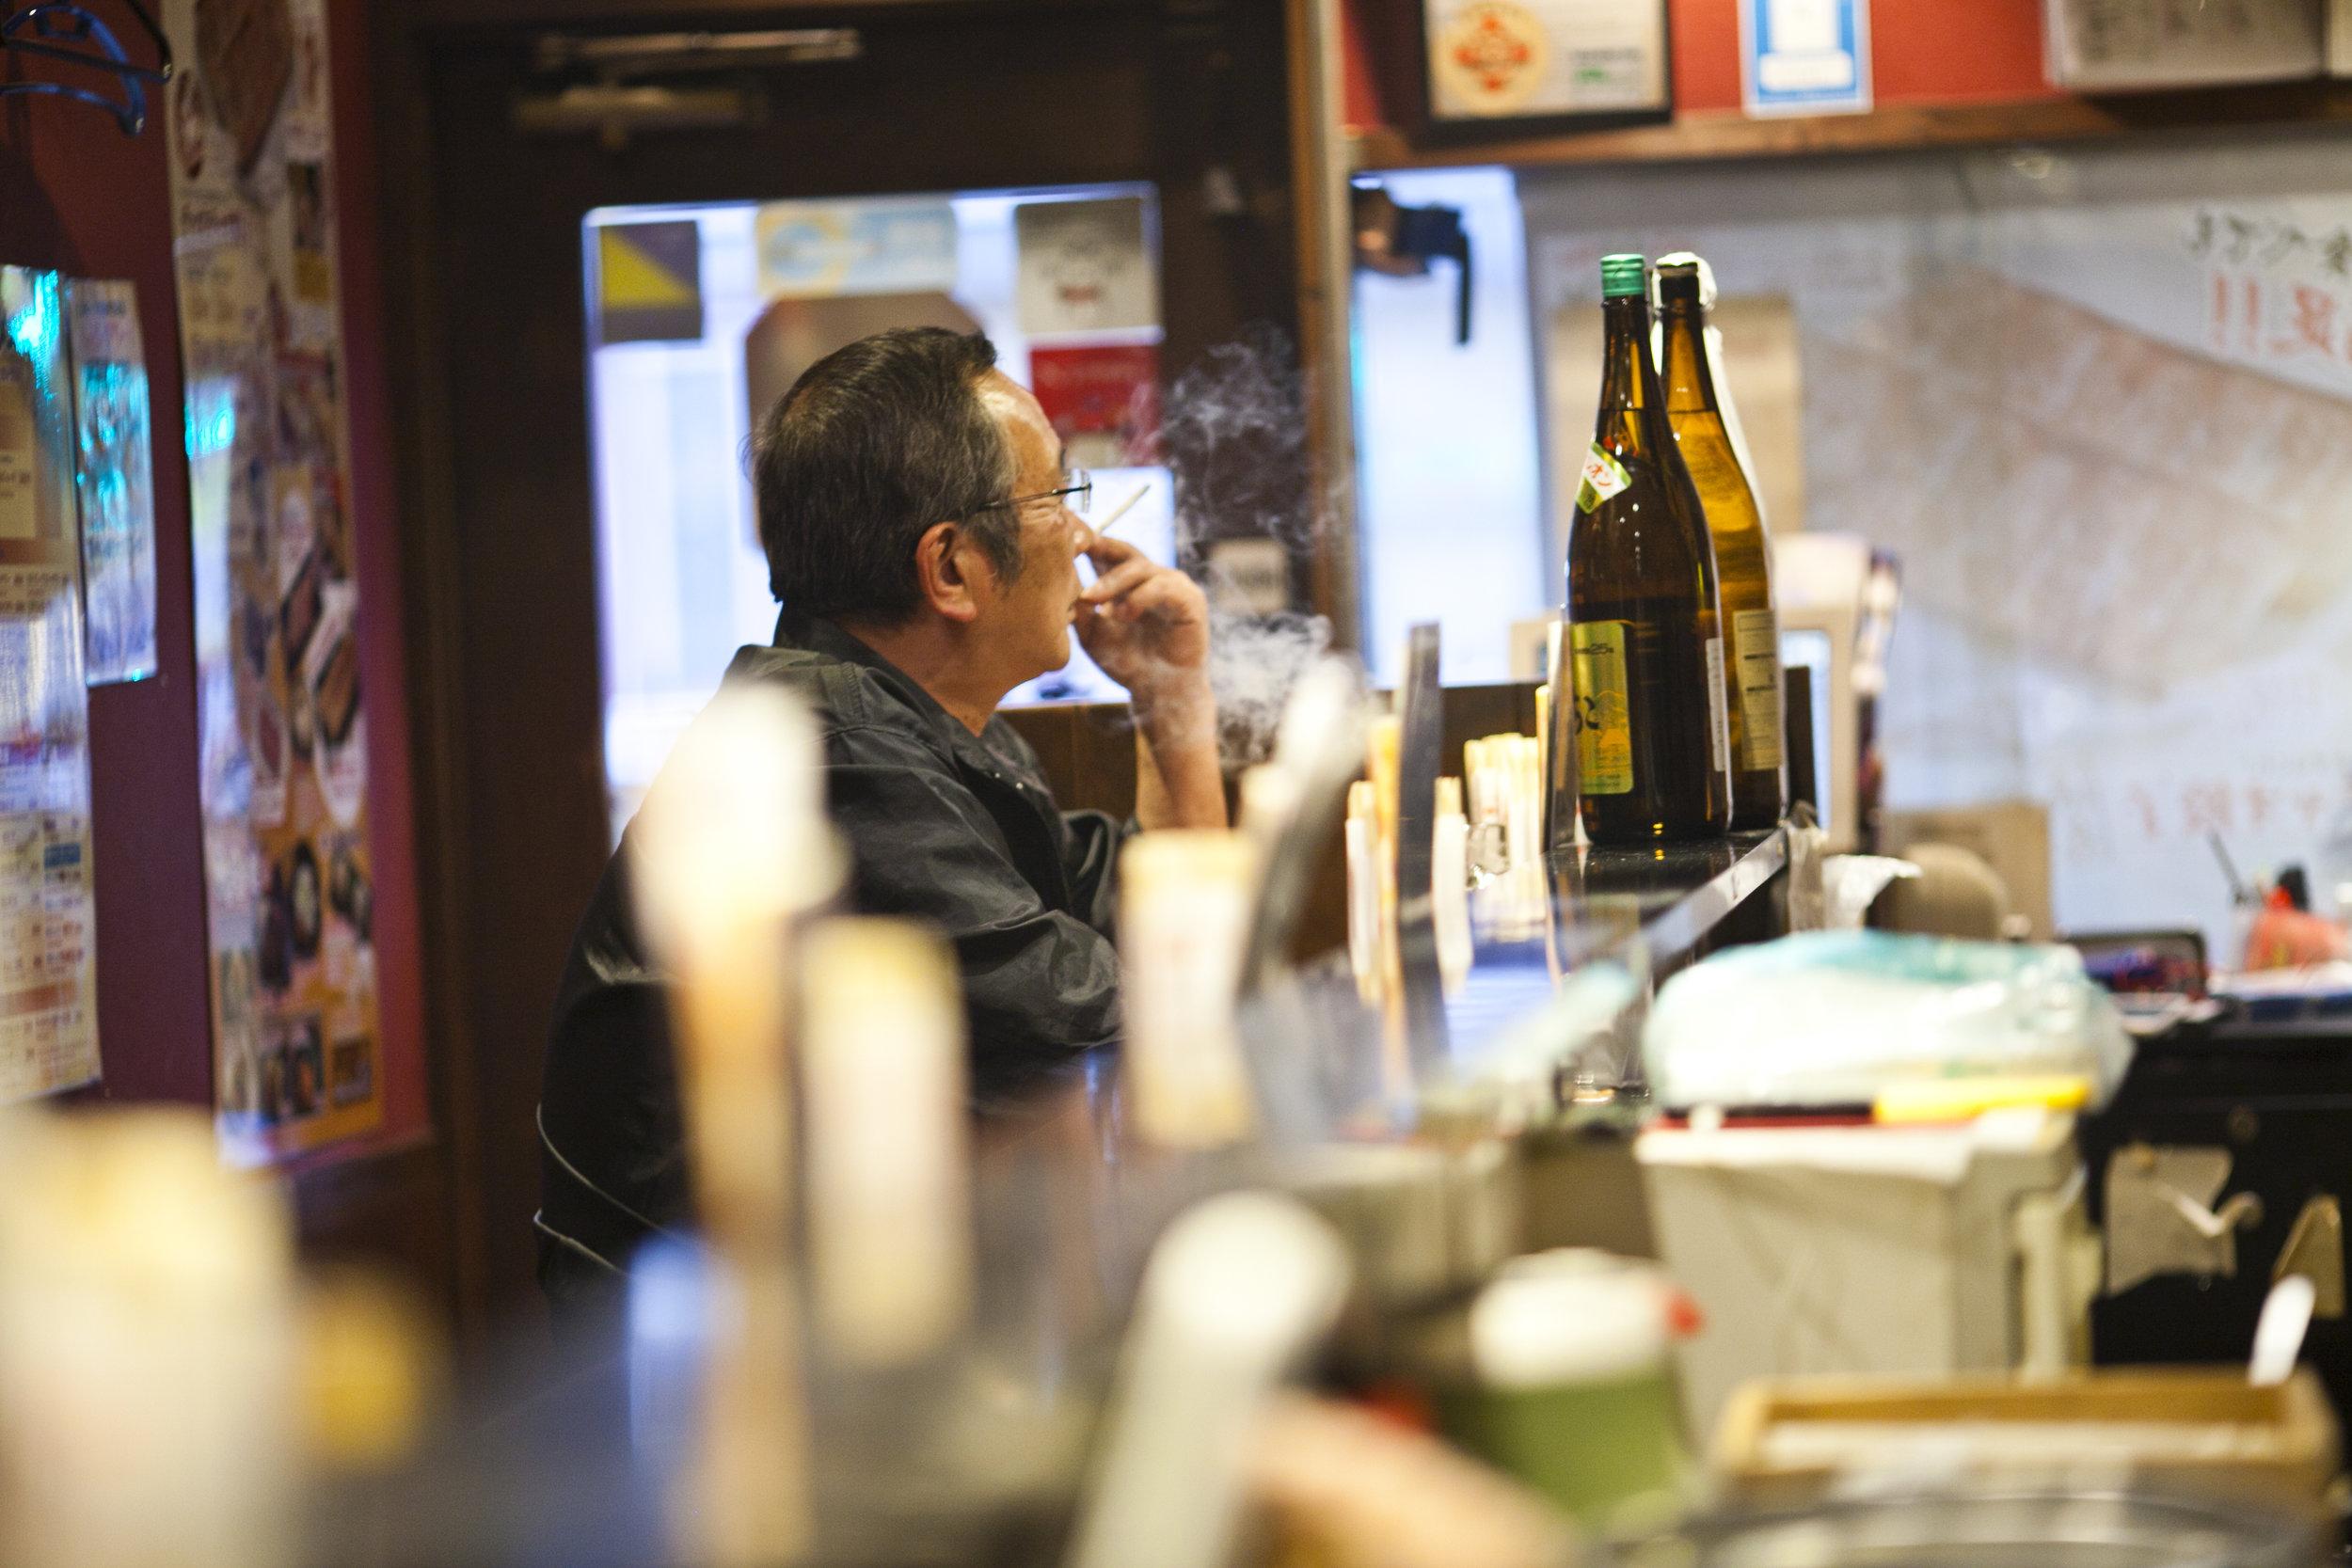 smoking tokyo gyoza bar.jpg